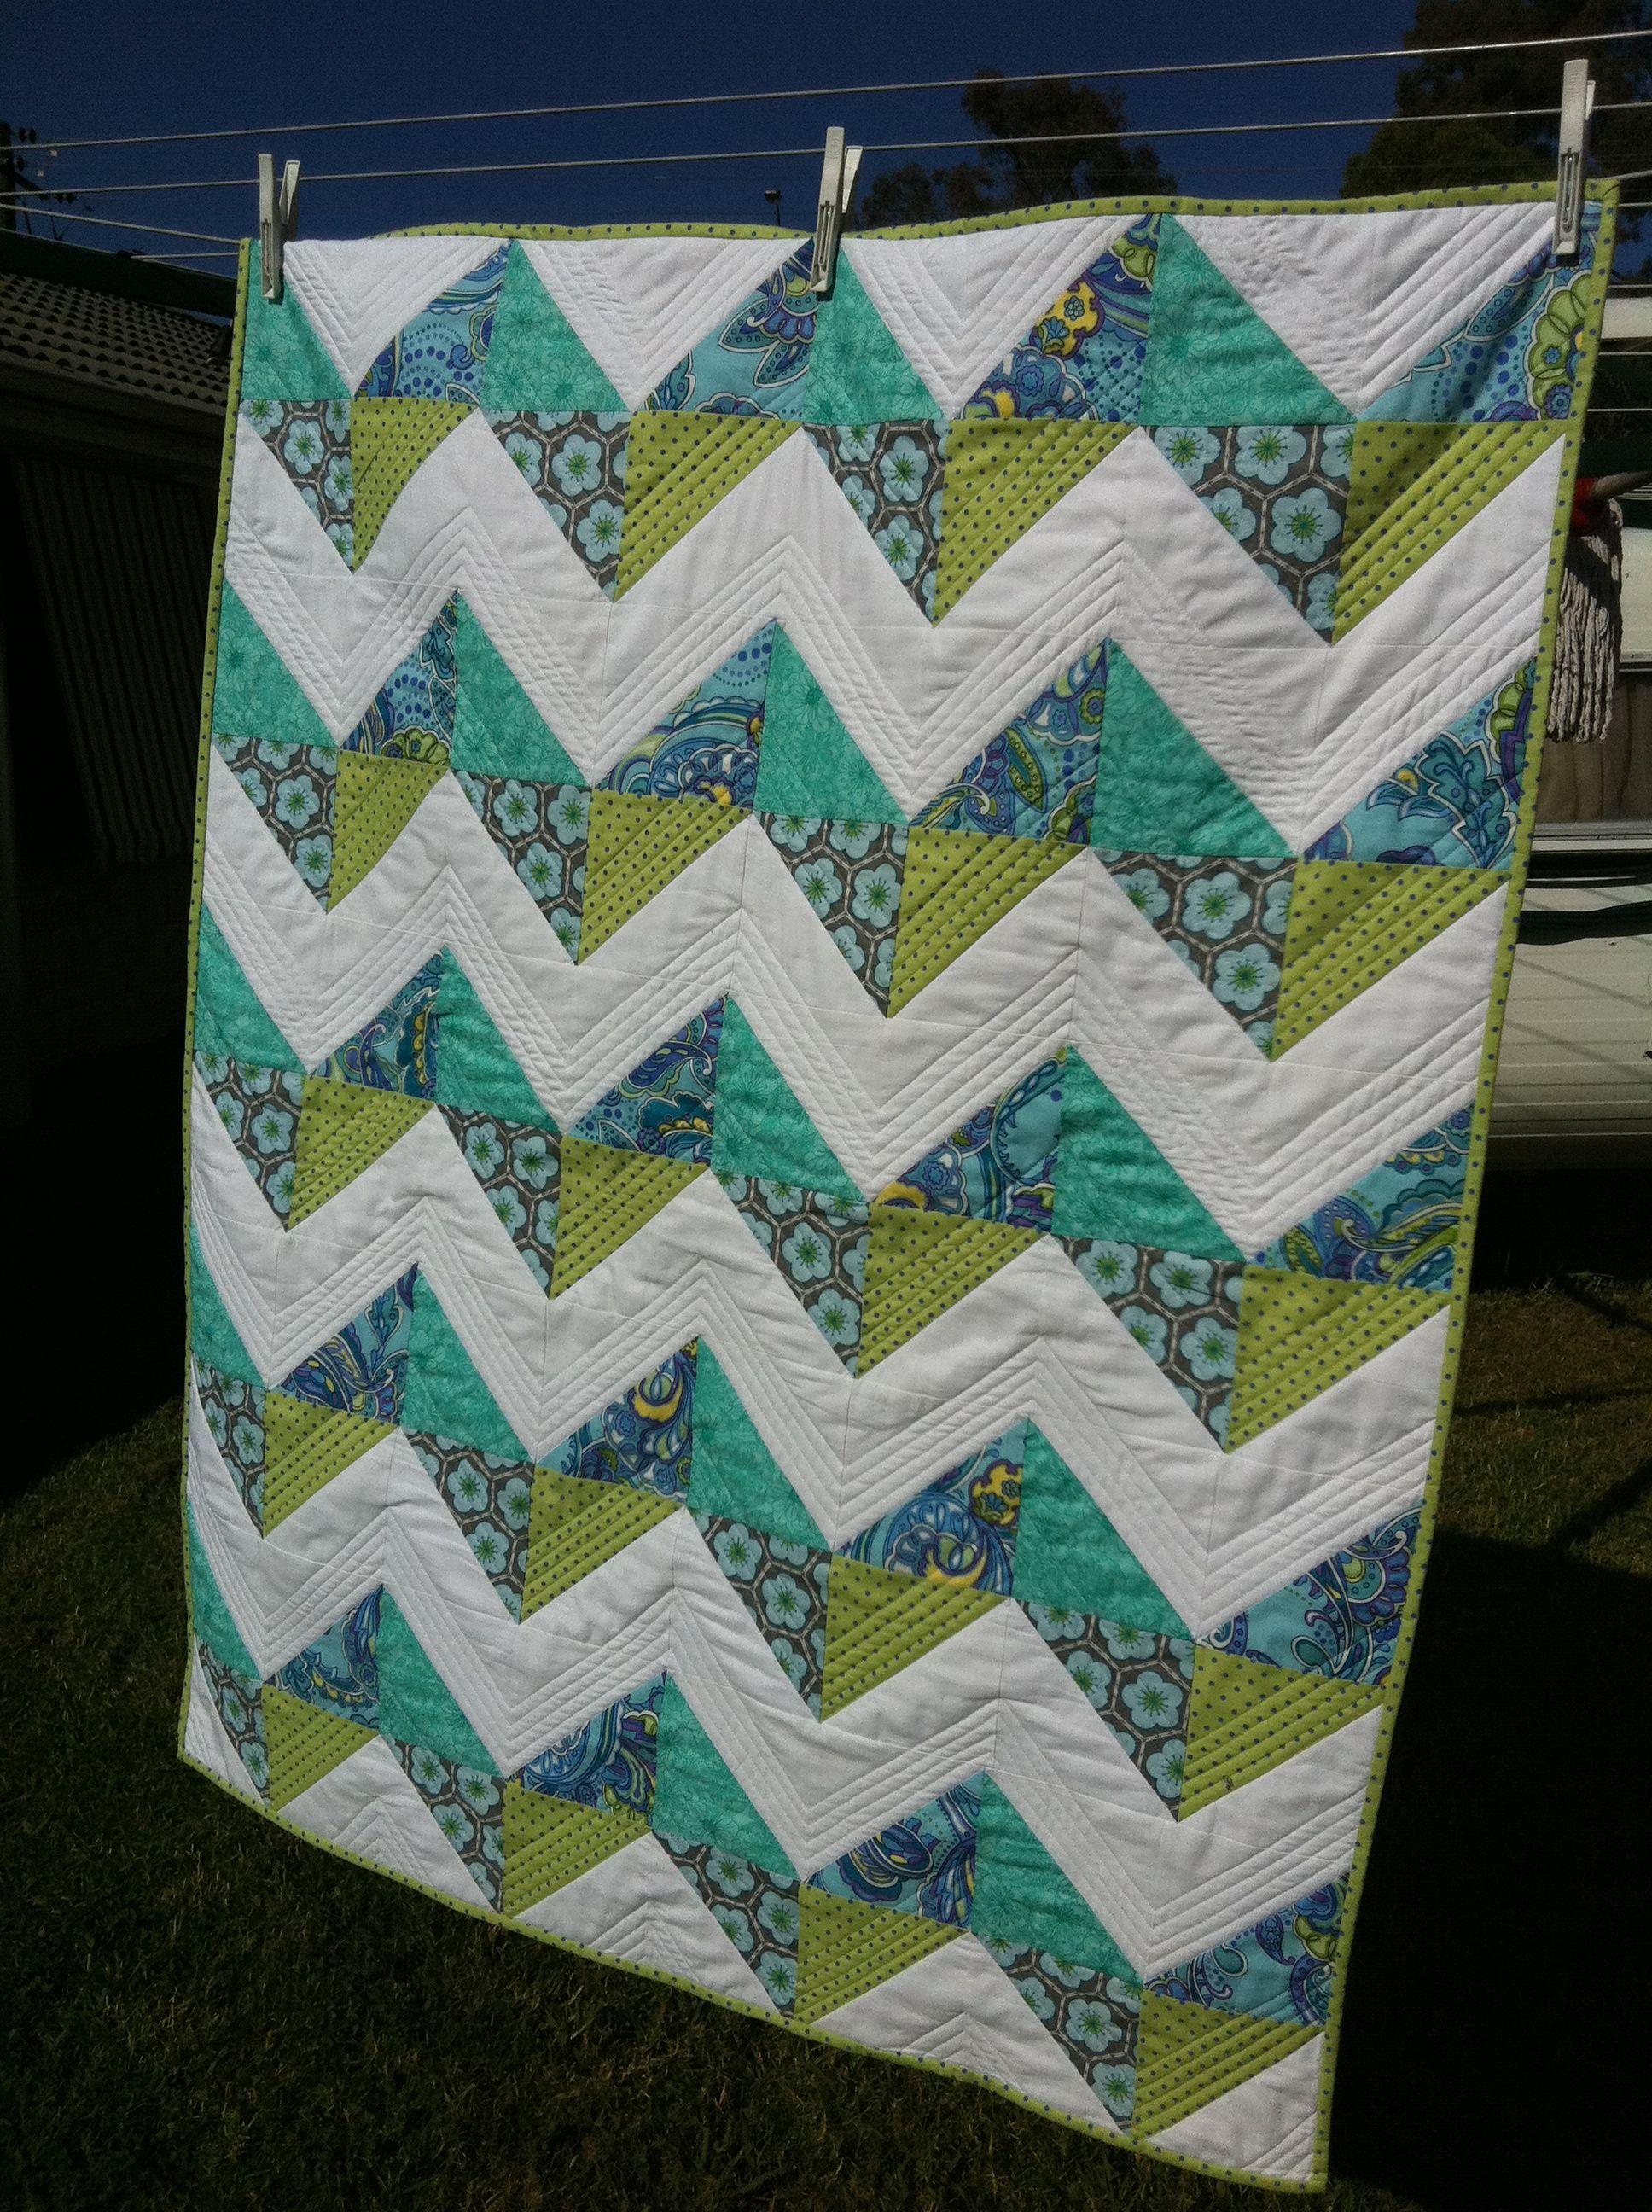 Summer Zig-Zag Quilt | Quilts | Pinterest | Quilt, Summer and ... : zig zag quilt - Adamdwight.com